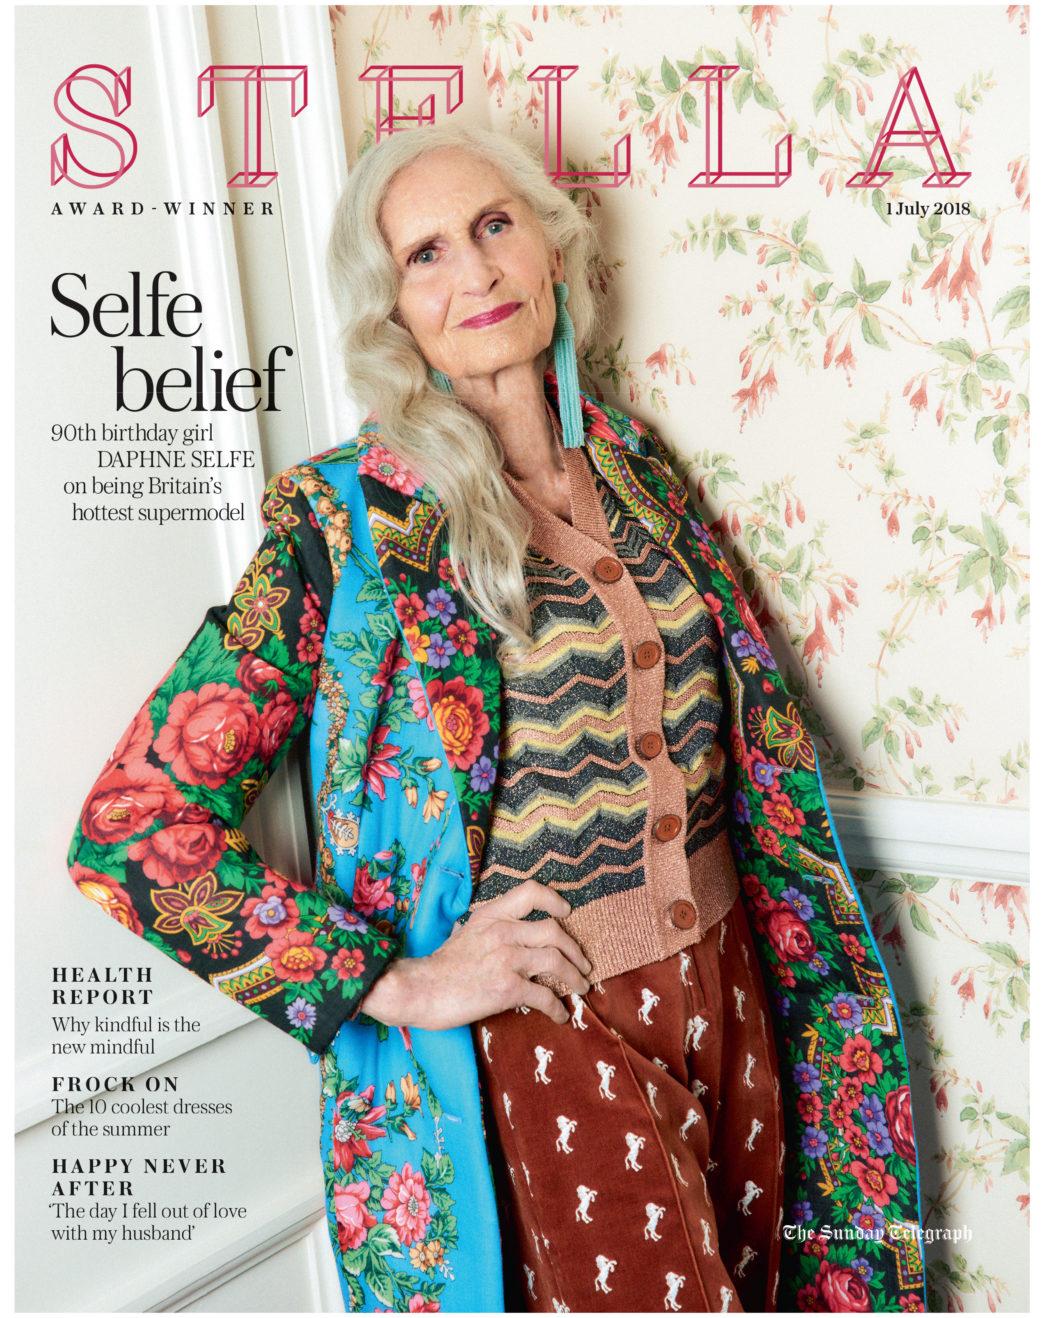 Daphne Selfe Sunday Telegraph Magazine_01-07-2018_Main_1st_p1